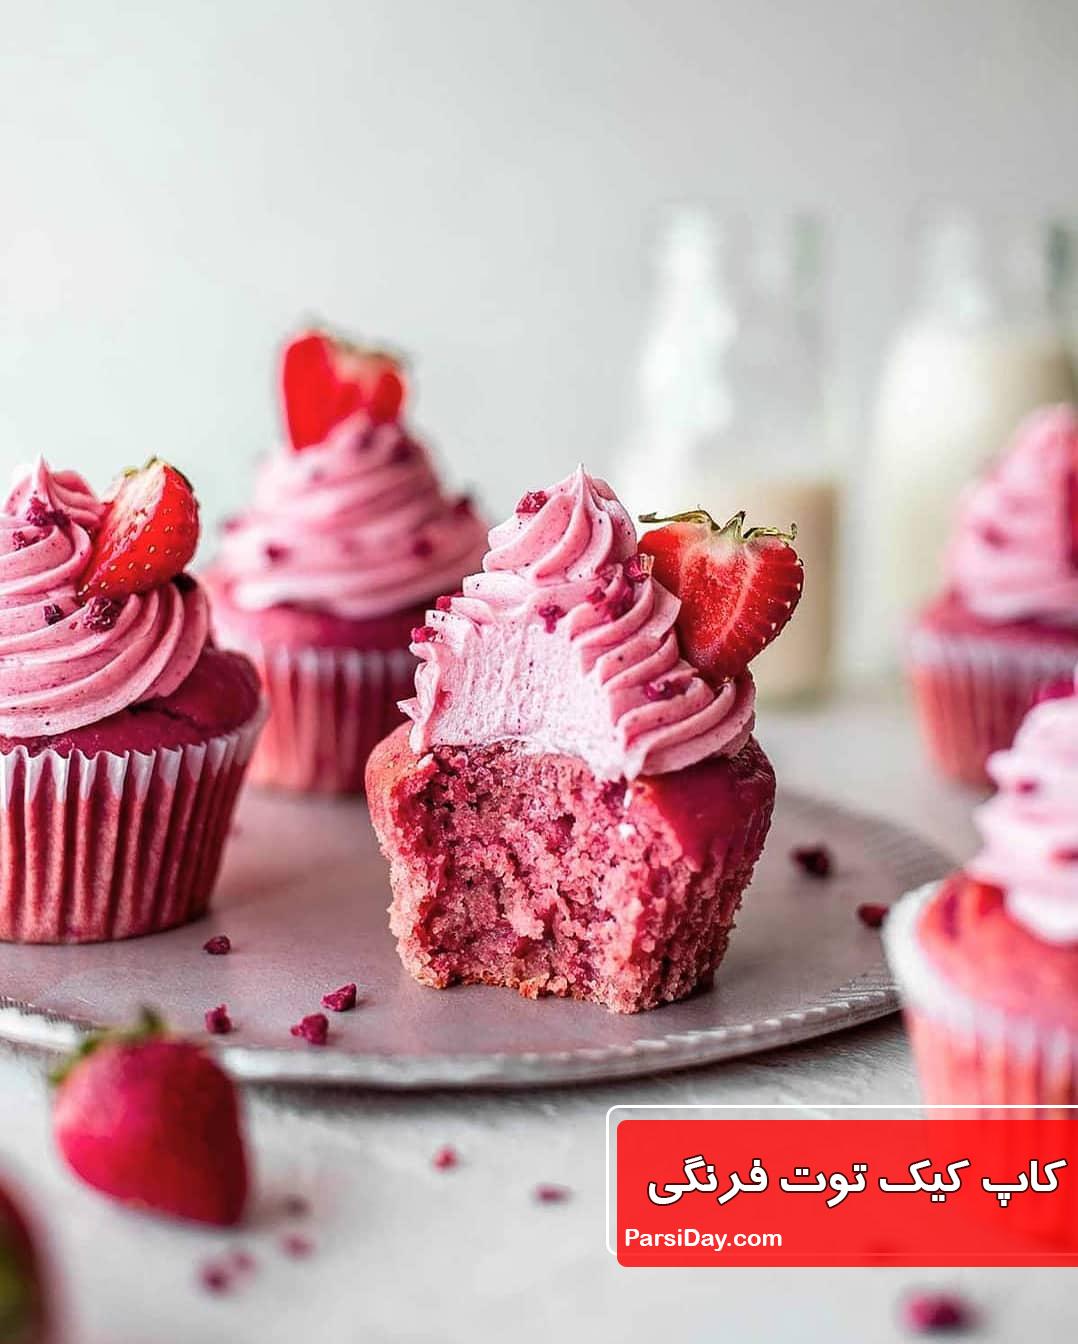 طرز تهیه کاپ کیک توت فرنگی